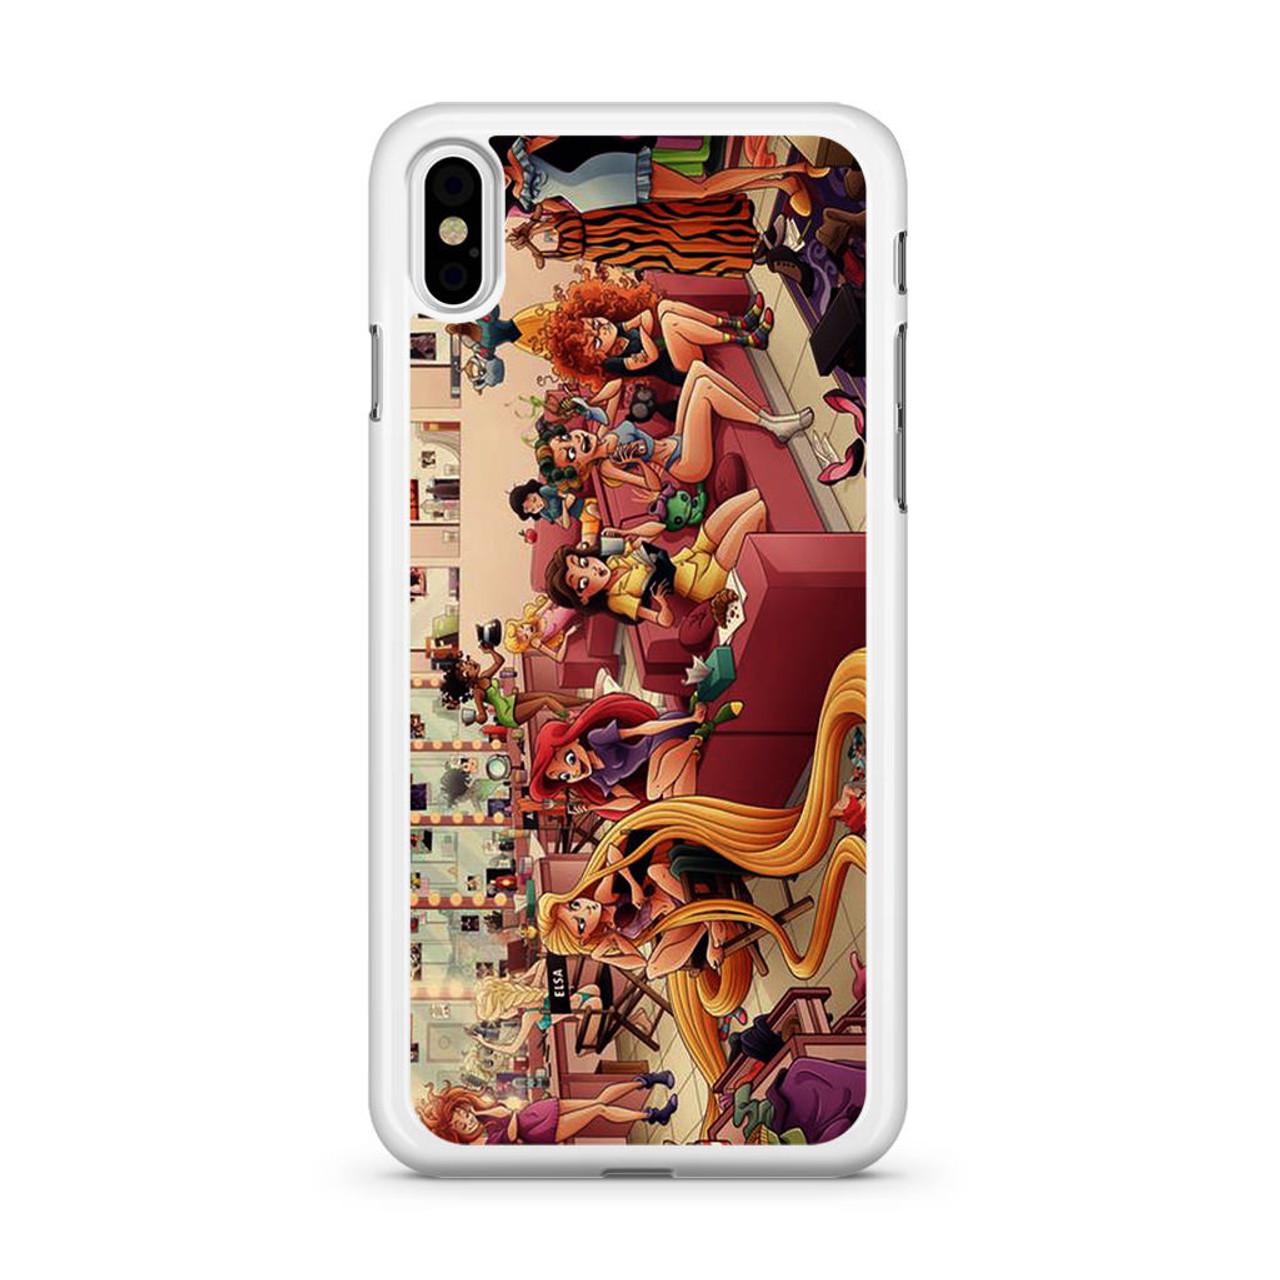 iPhone XS/iPhone X Case DISNEY Princess